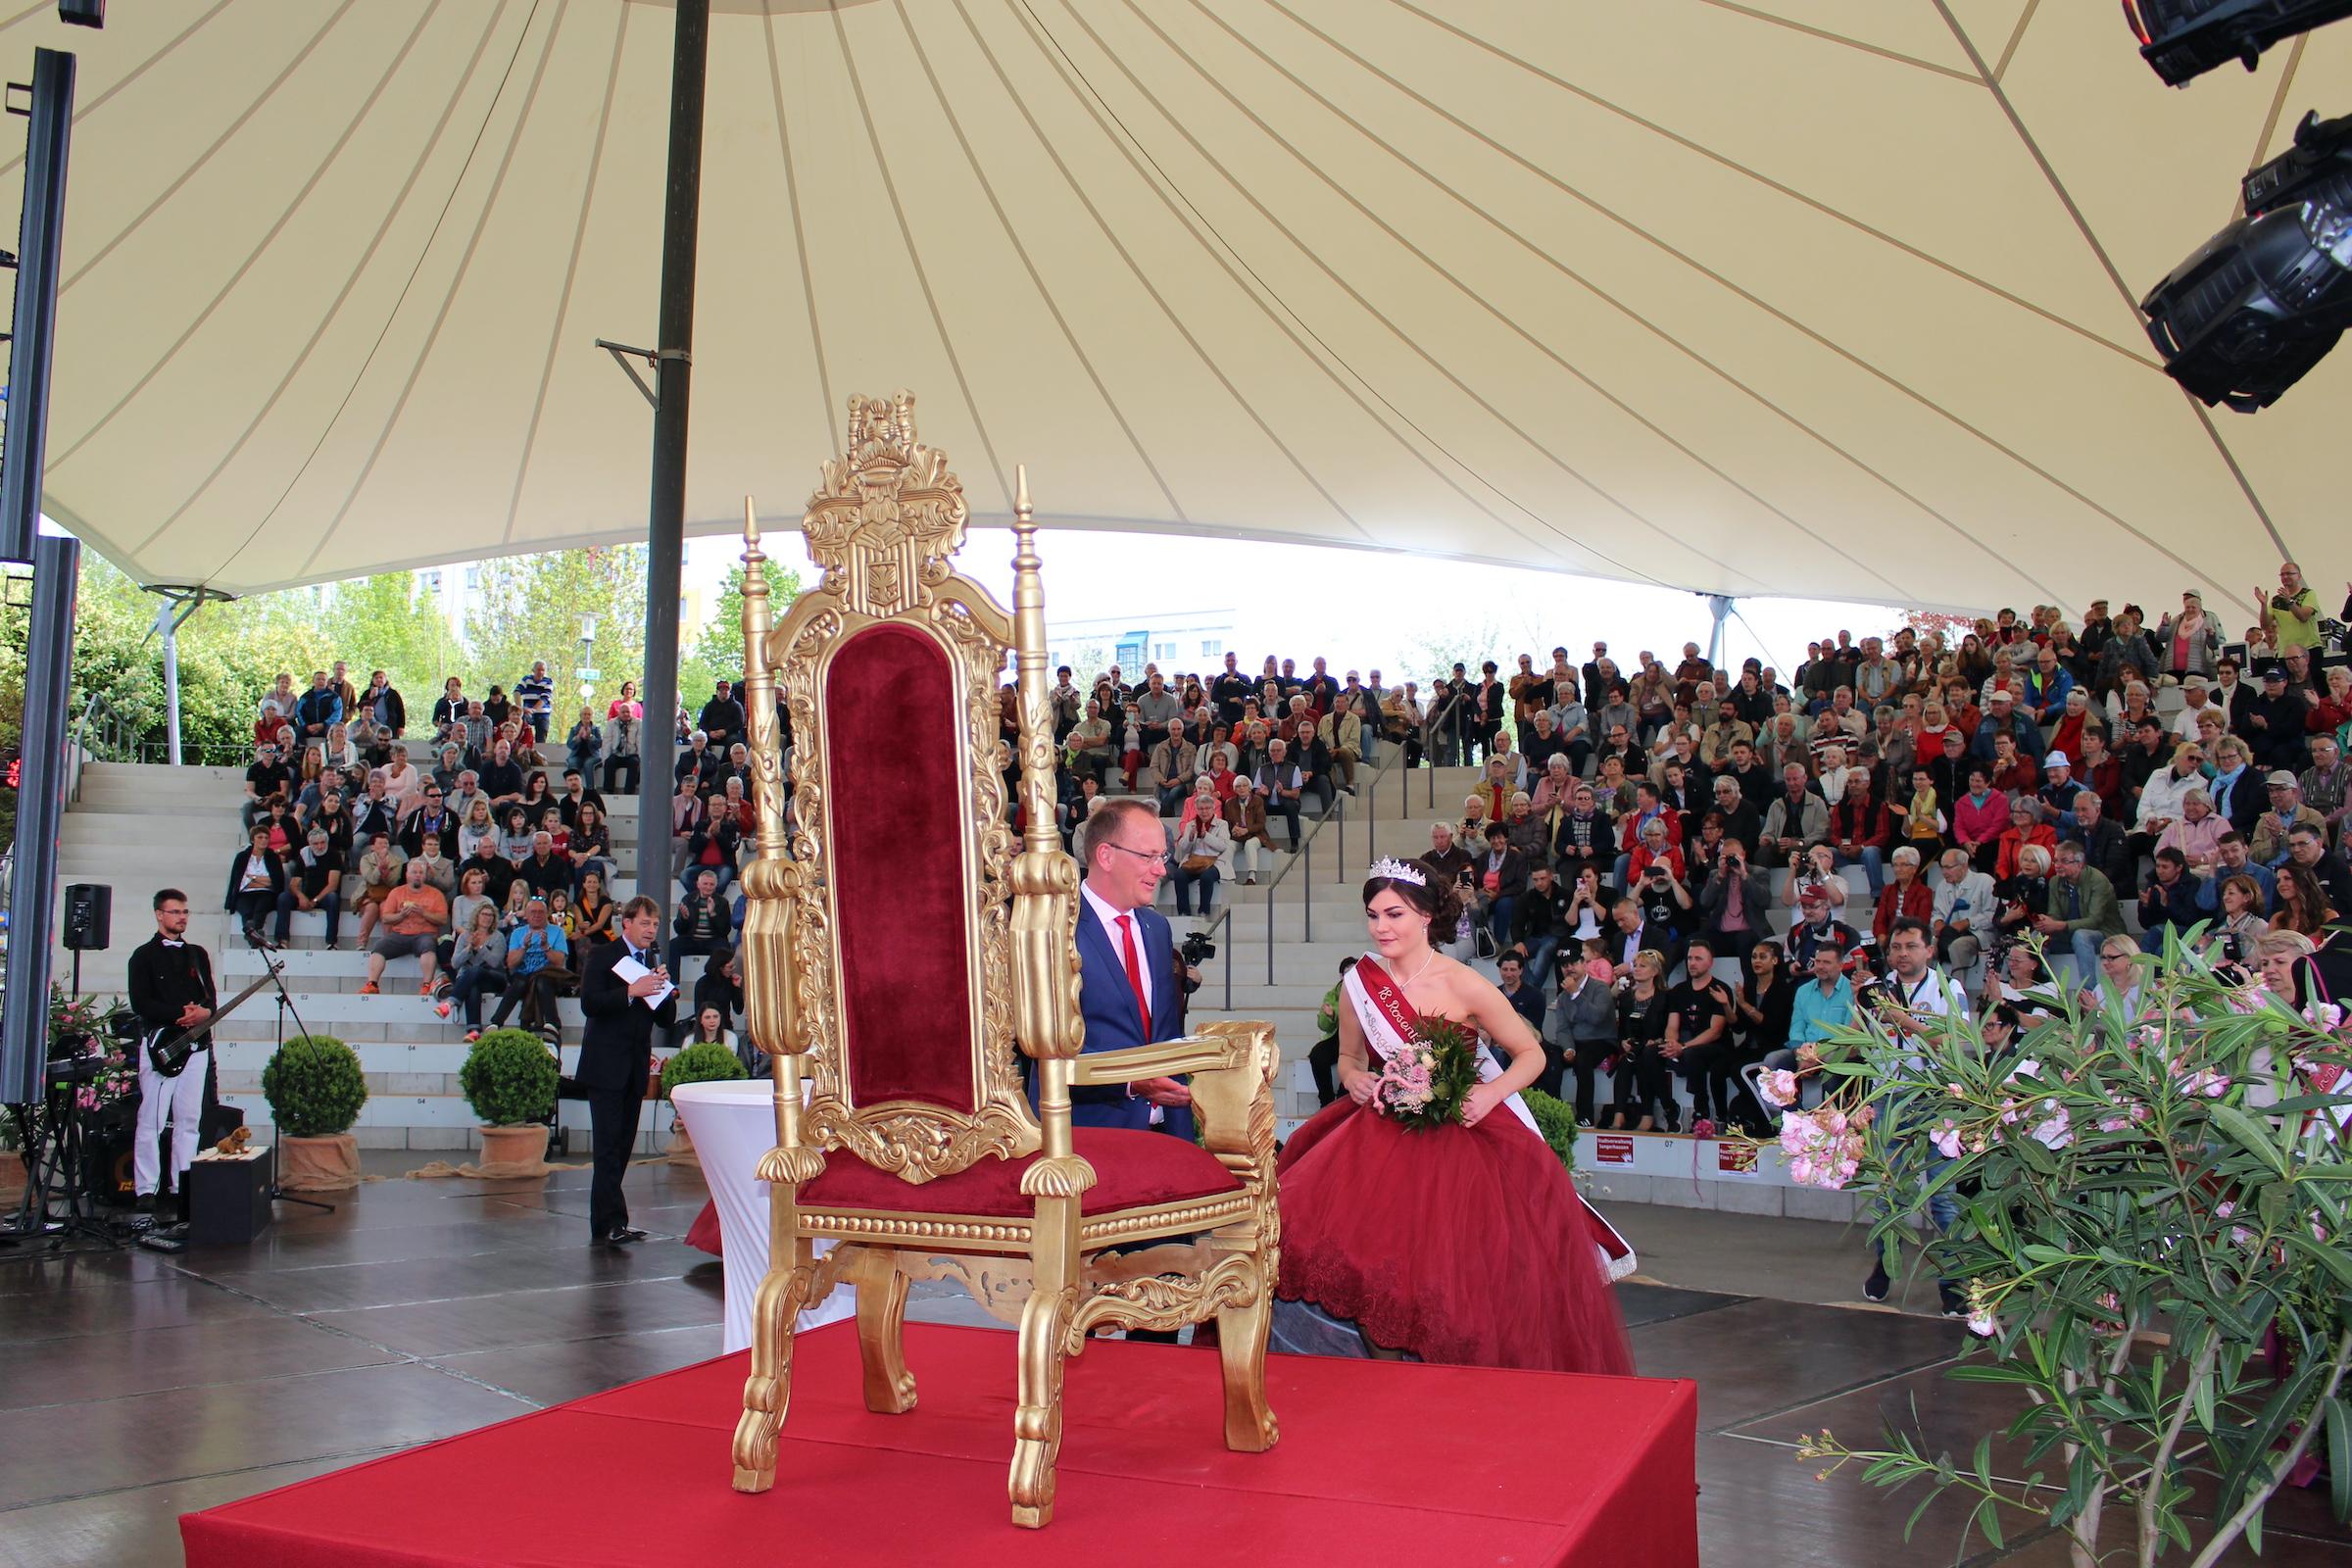 Berg- & Rosenfest mit Majestätenkrönung